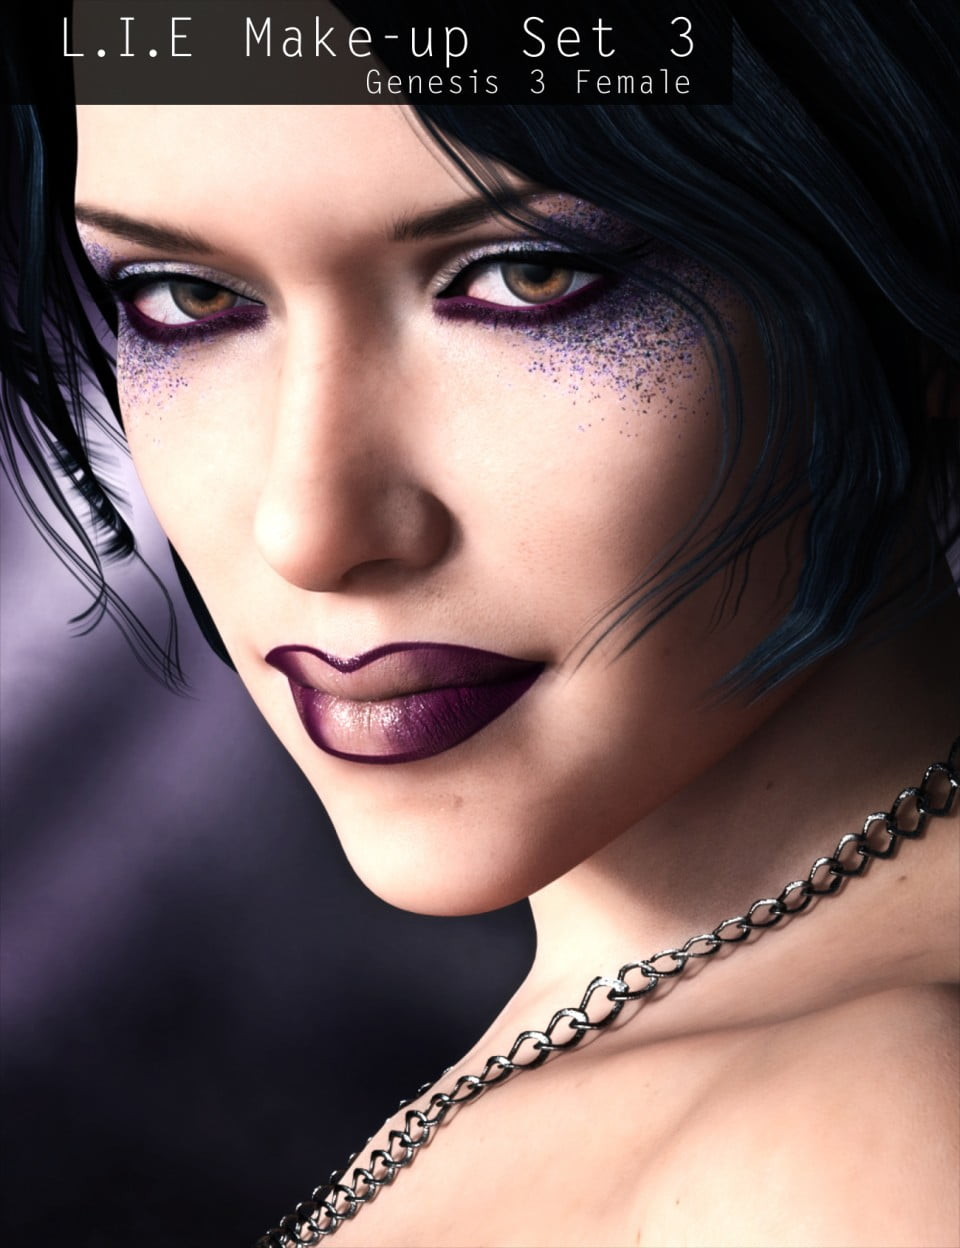 L.I.E Make-up Set 3 for Genesis 3 Female(s)